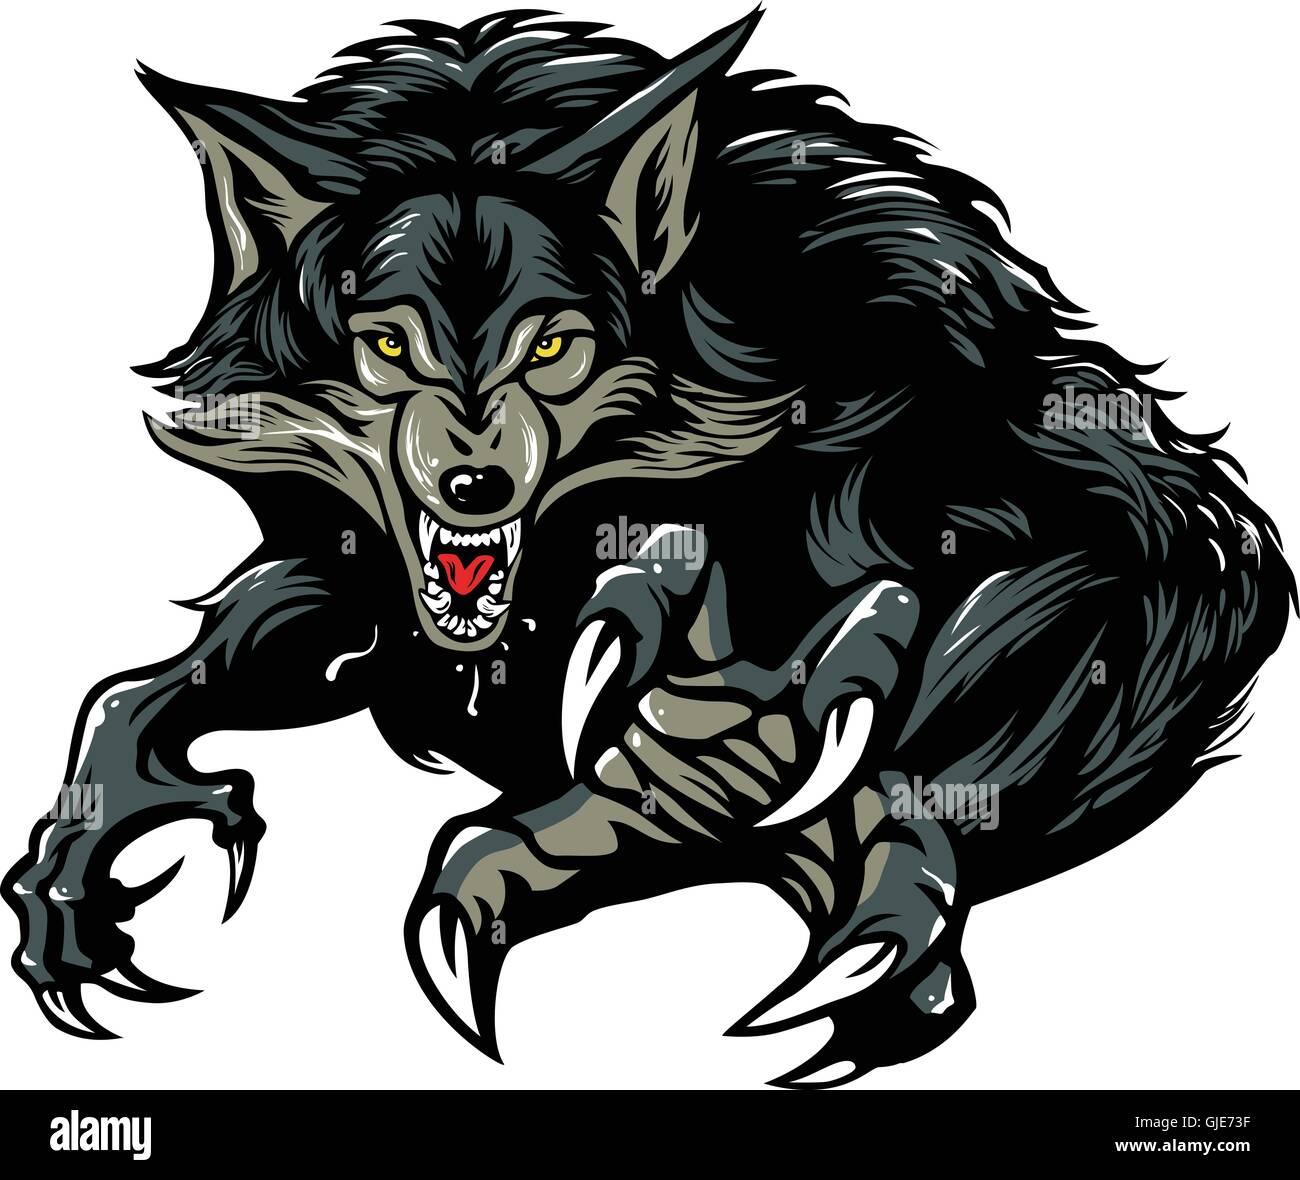 Werewolf Vector Illustration Character Design Stock Vector Image & Art - Alamy